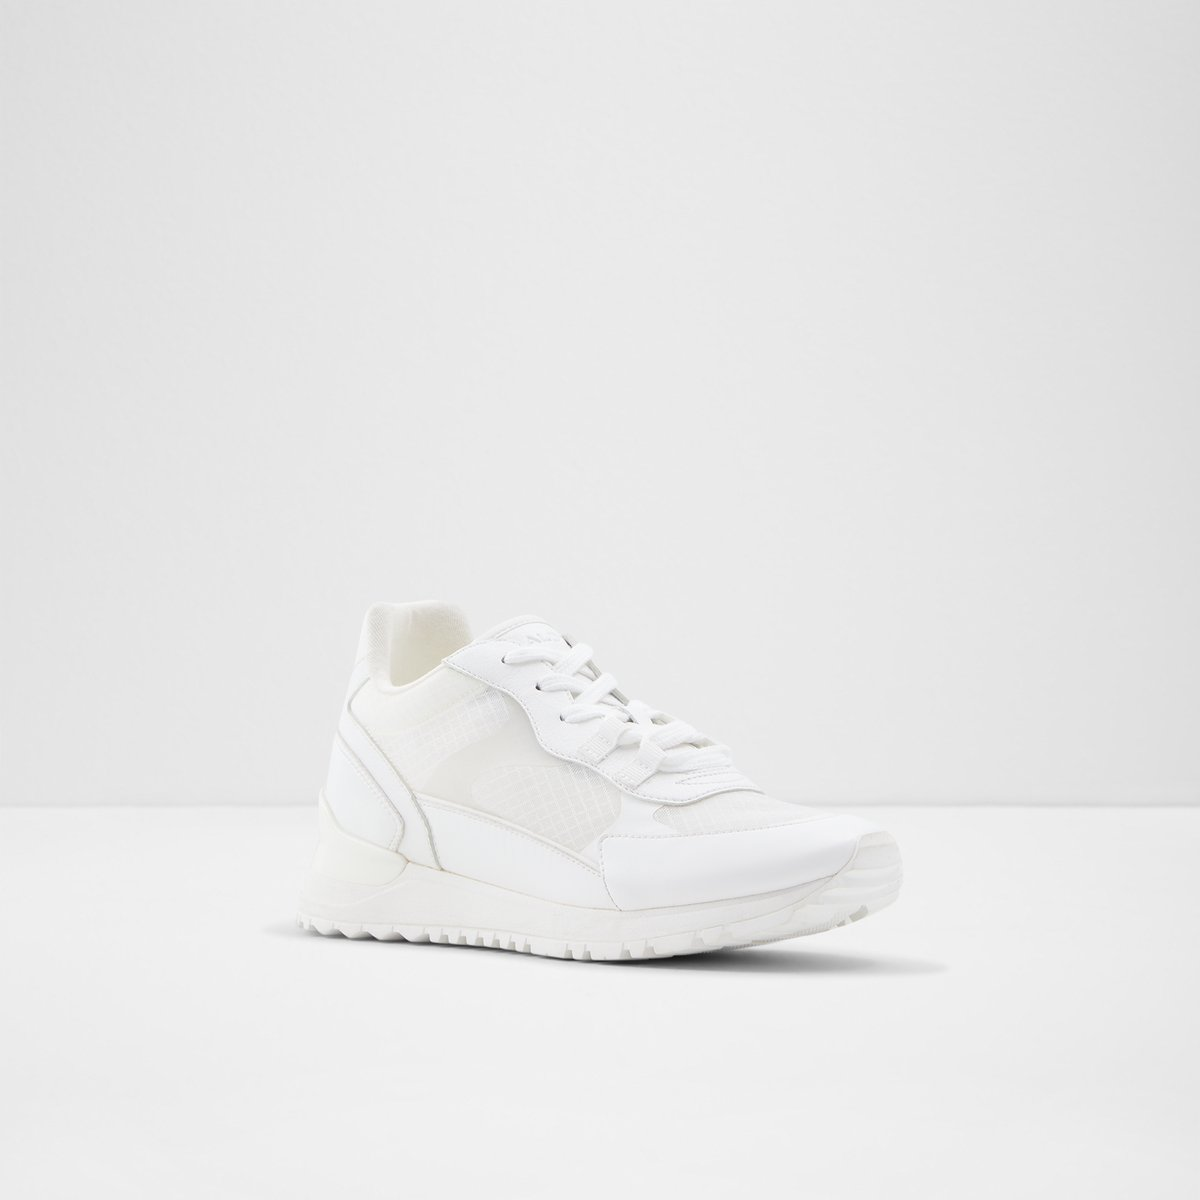 Esclub Sneaker ALDO by Aldo, available on nordstrom.com Emily Ratajkowski Shoes Exact Product